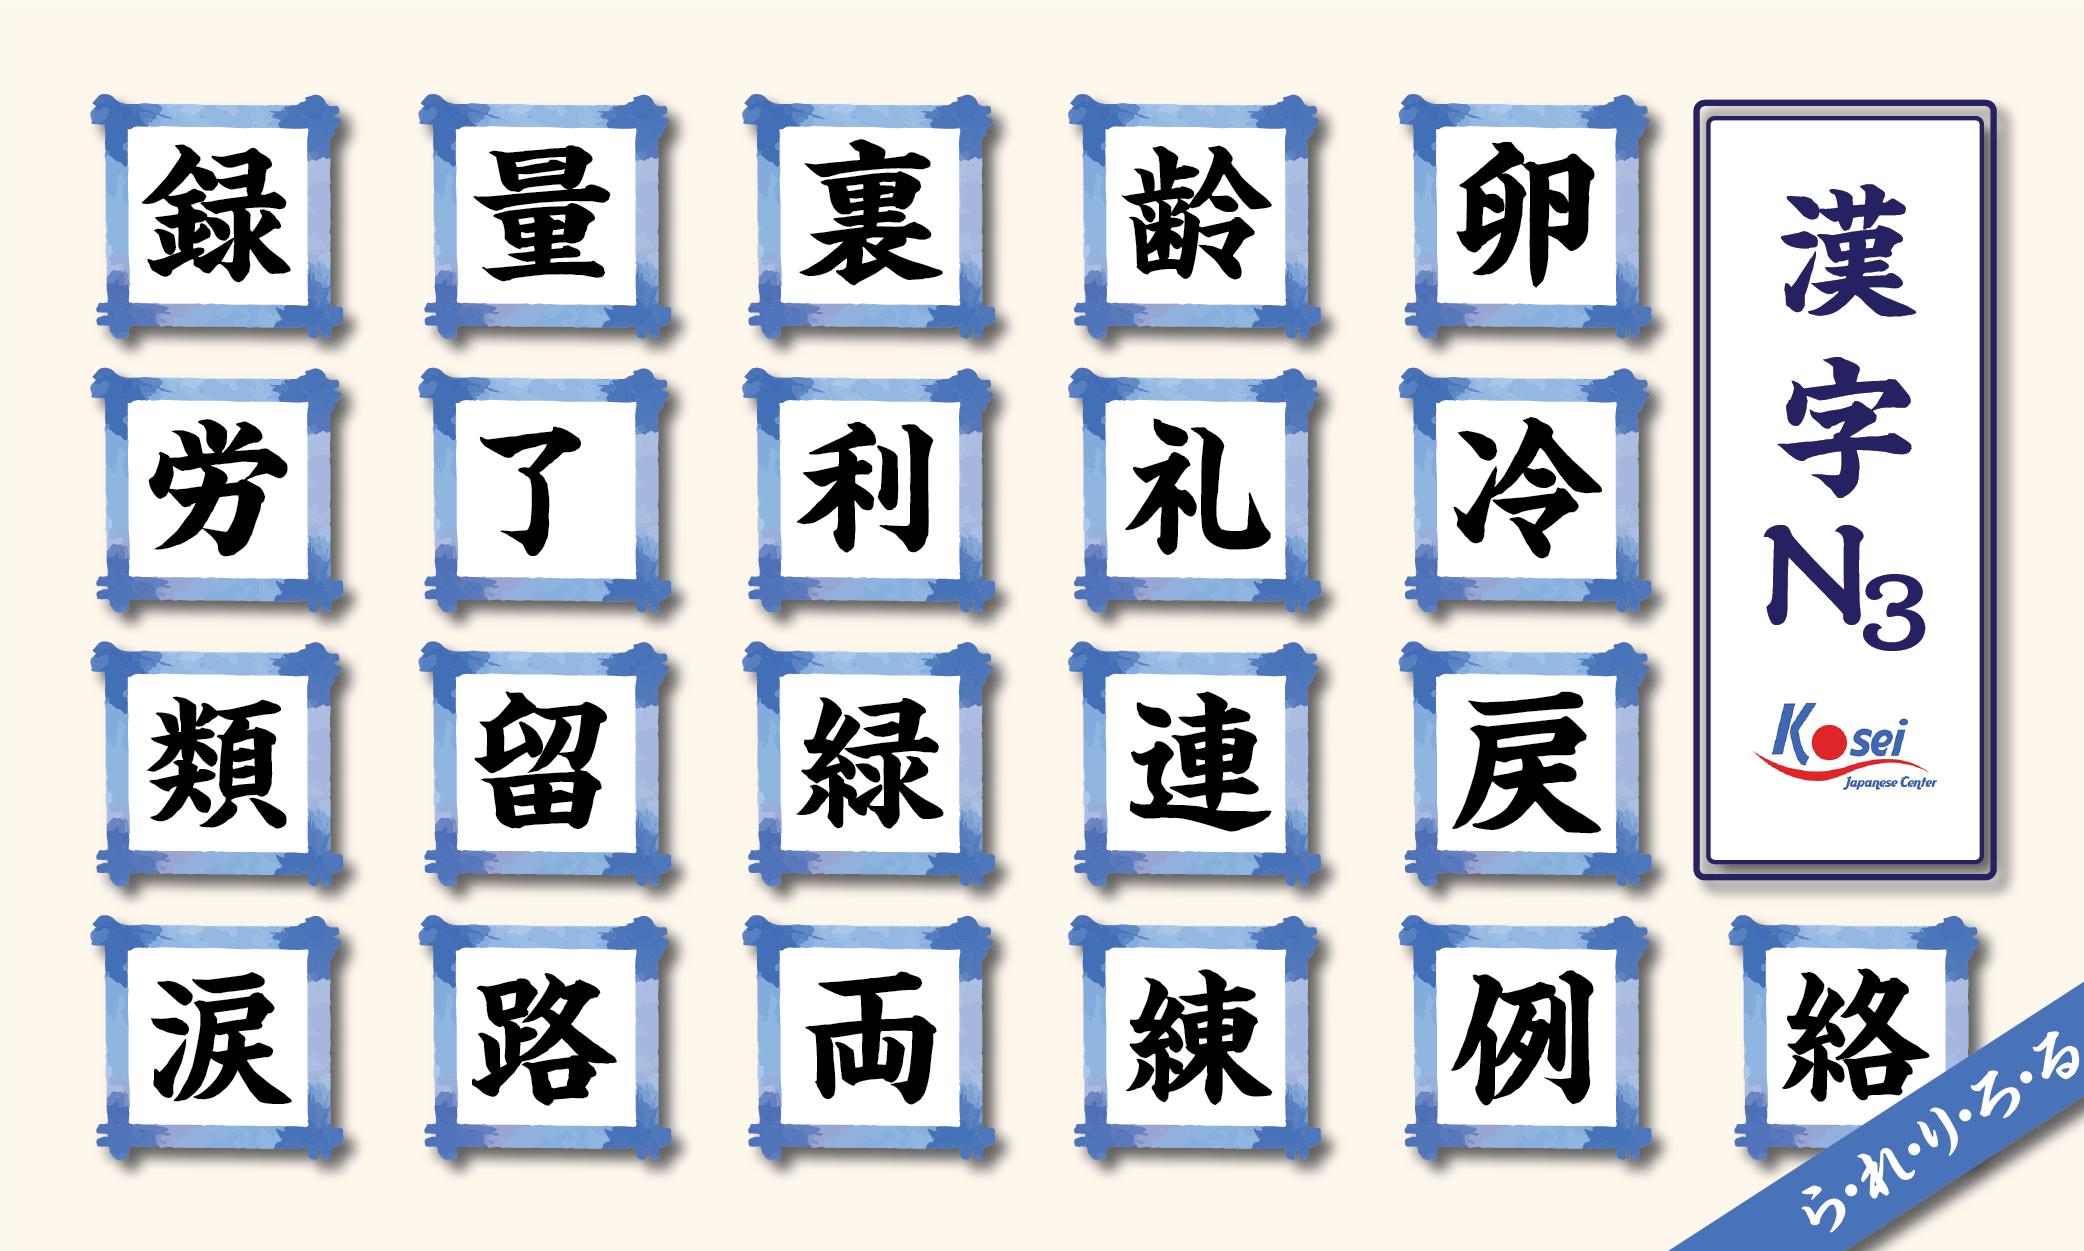 https://kosei.vn/tong-hop-kanji-n3-theo-am-on-hang-r-n2255.html